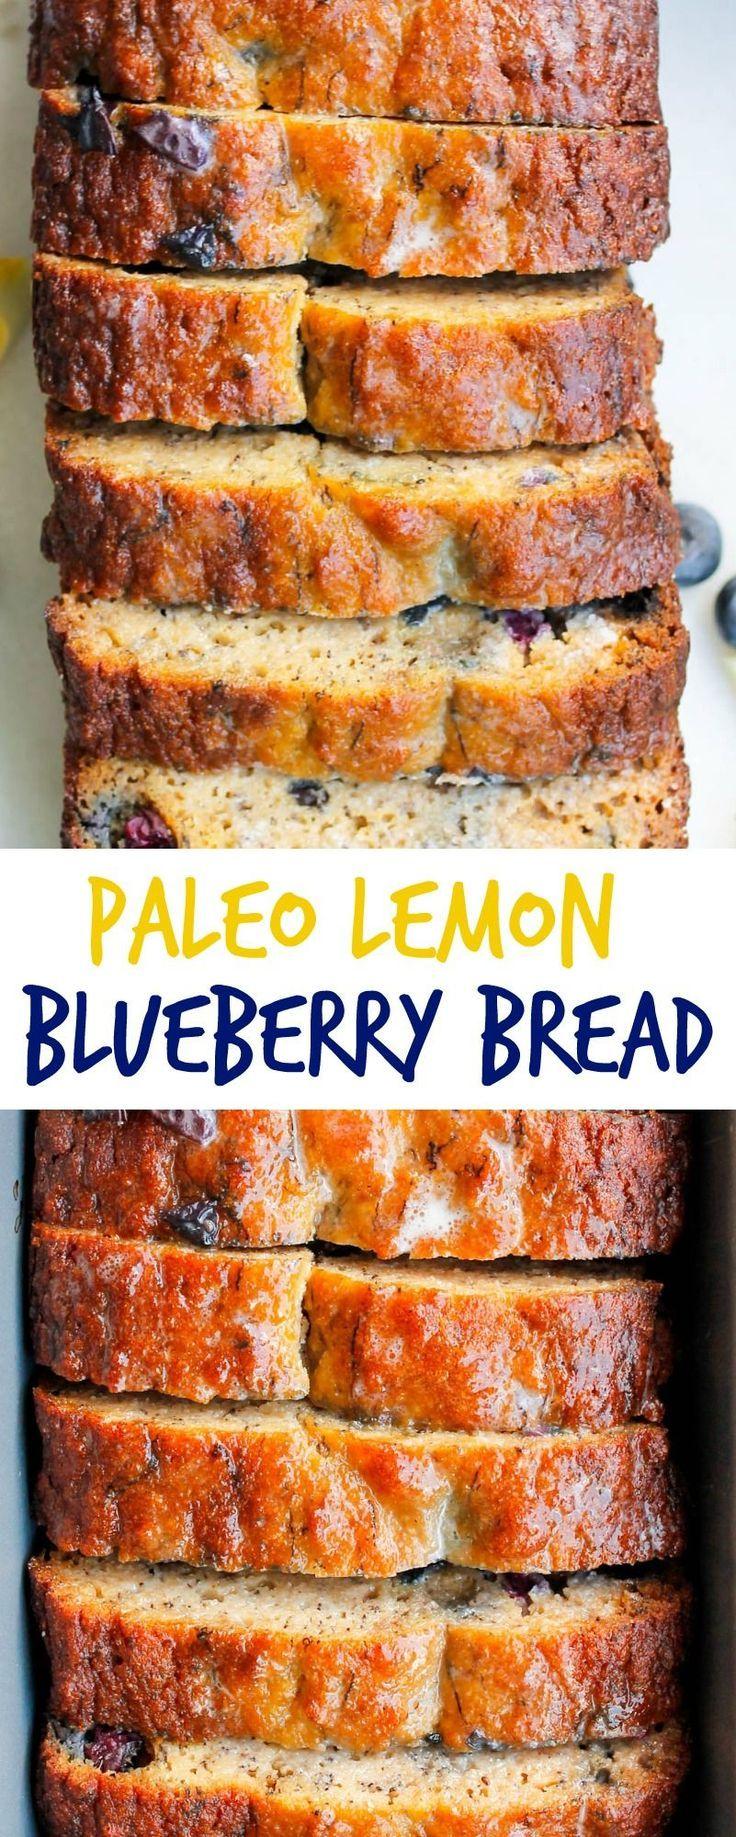 Paleo Lemon Blueberry Bread - Smile Sandwich